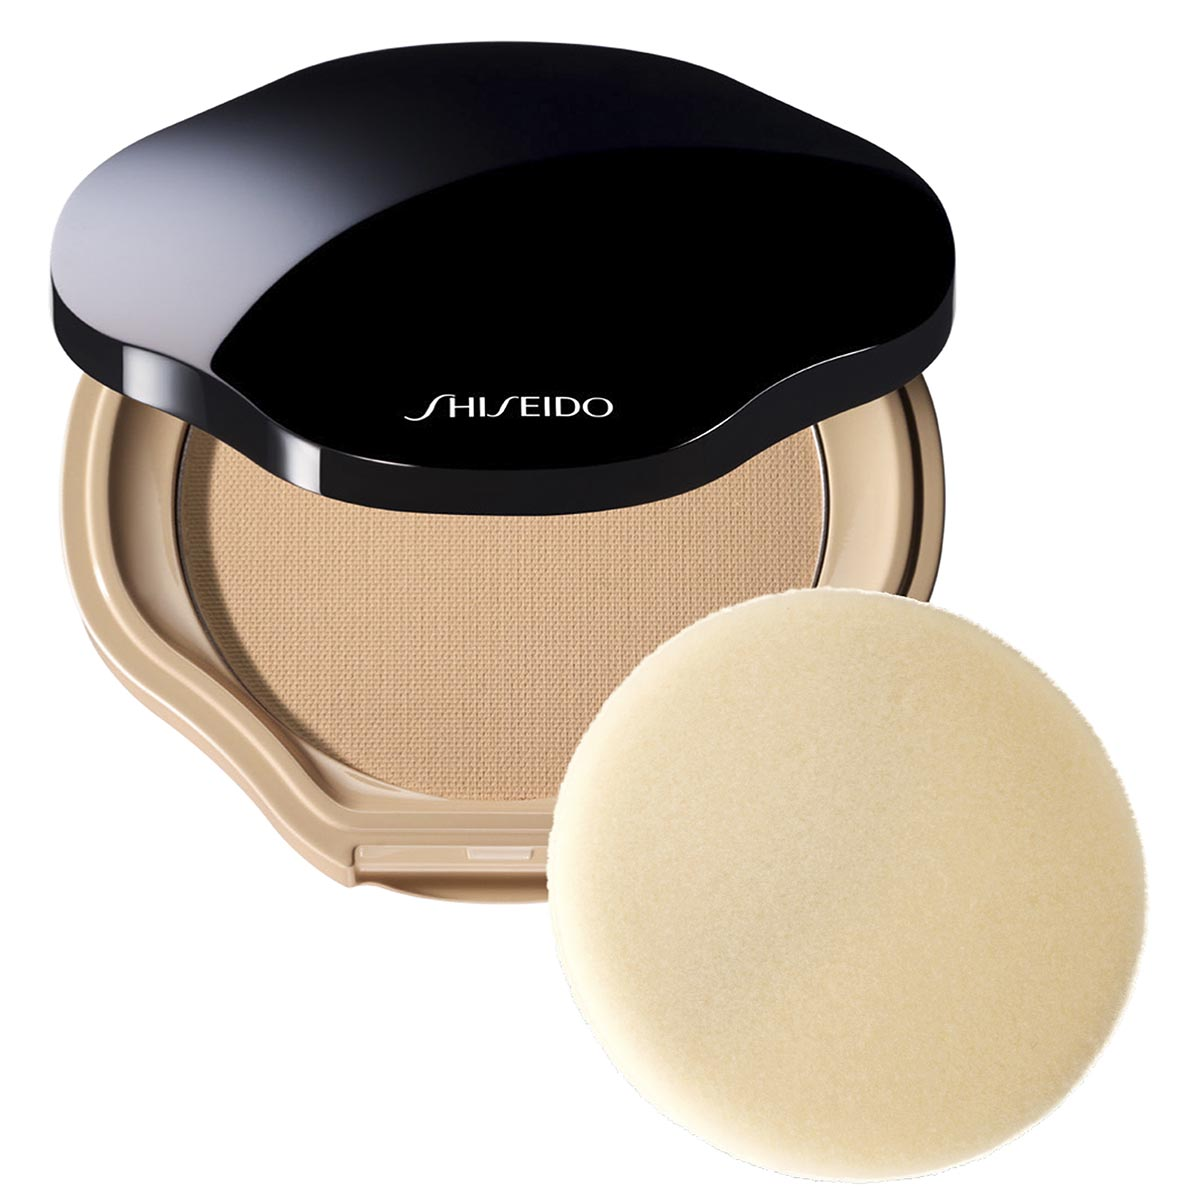 Shiseido sheer perfect compact i40